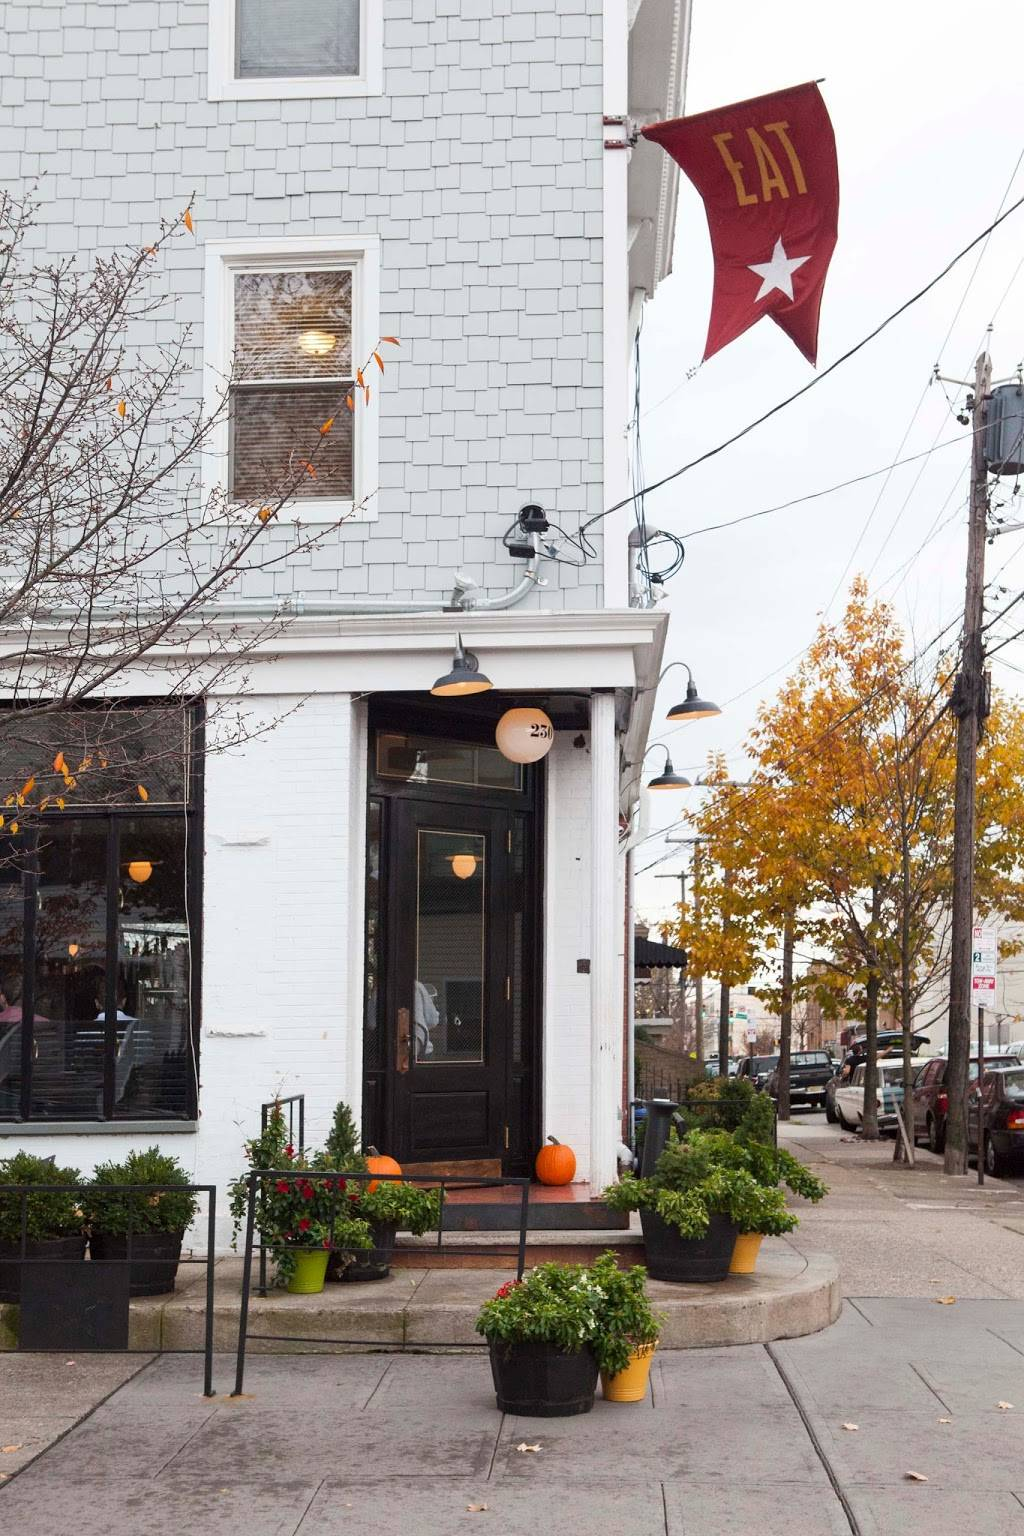 White Star Bar | restaurant | 230 Brunswick St, Jersey City, NJ 07302, USA | 2016539234 OR +1 201-653-9234